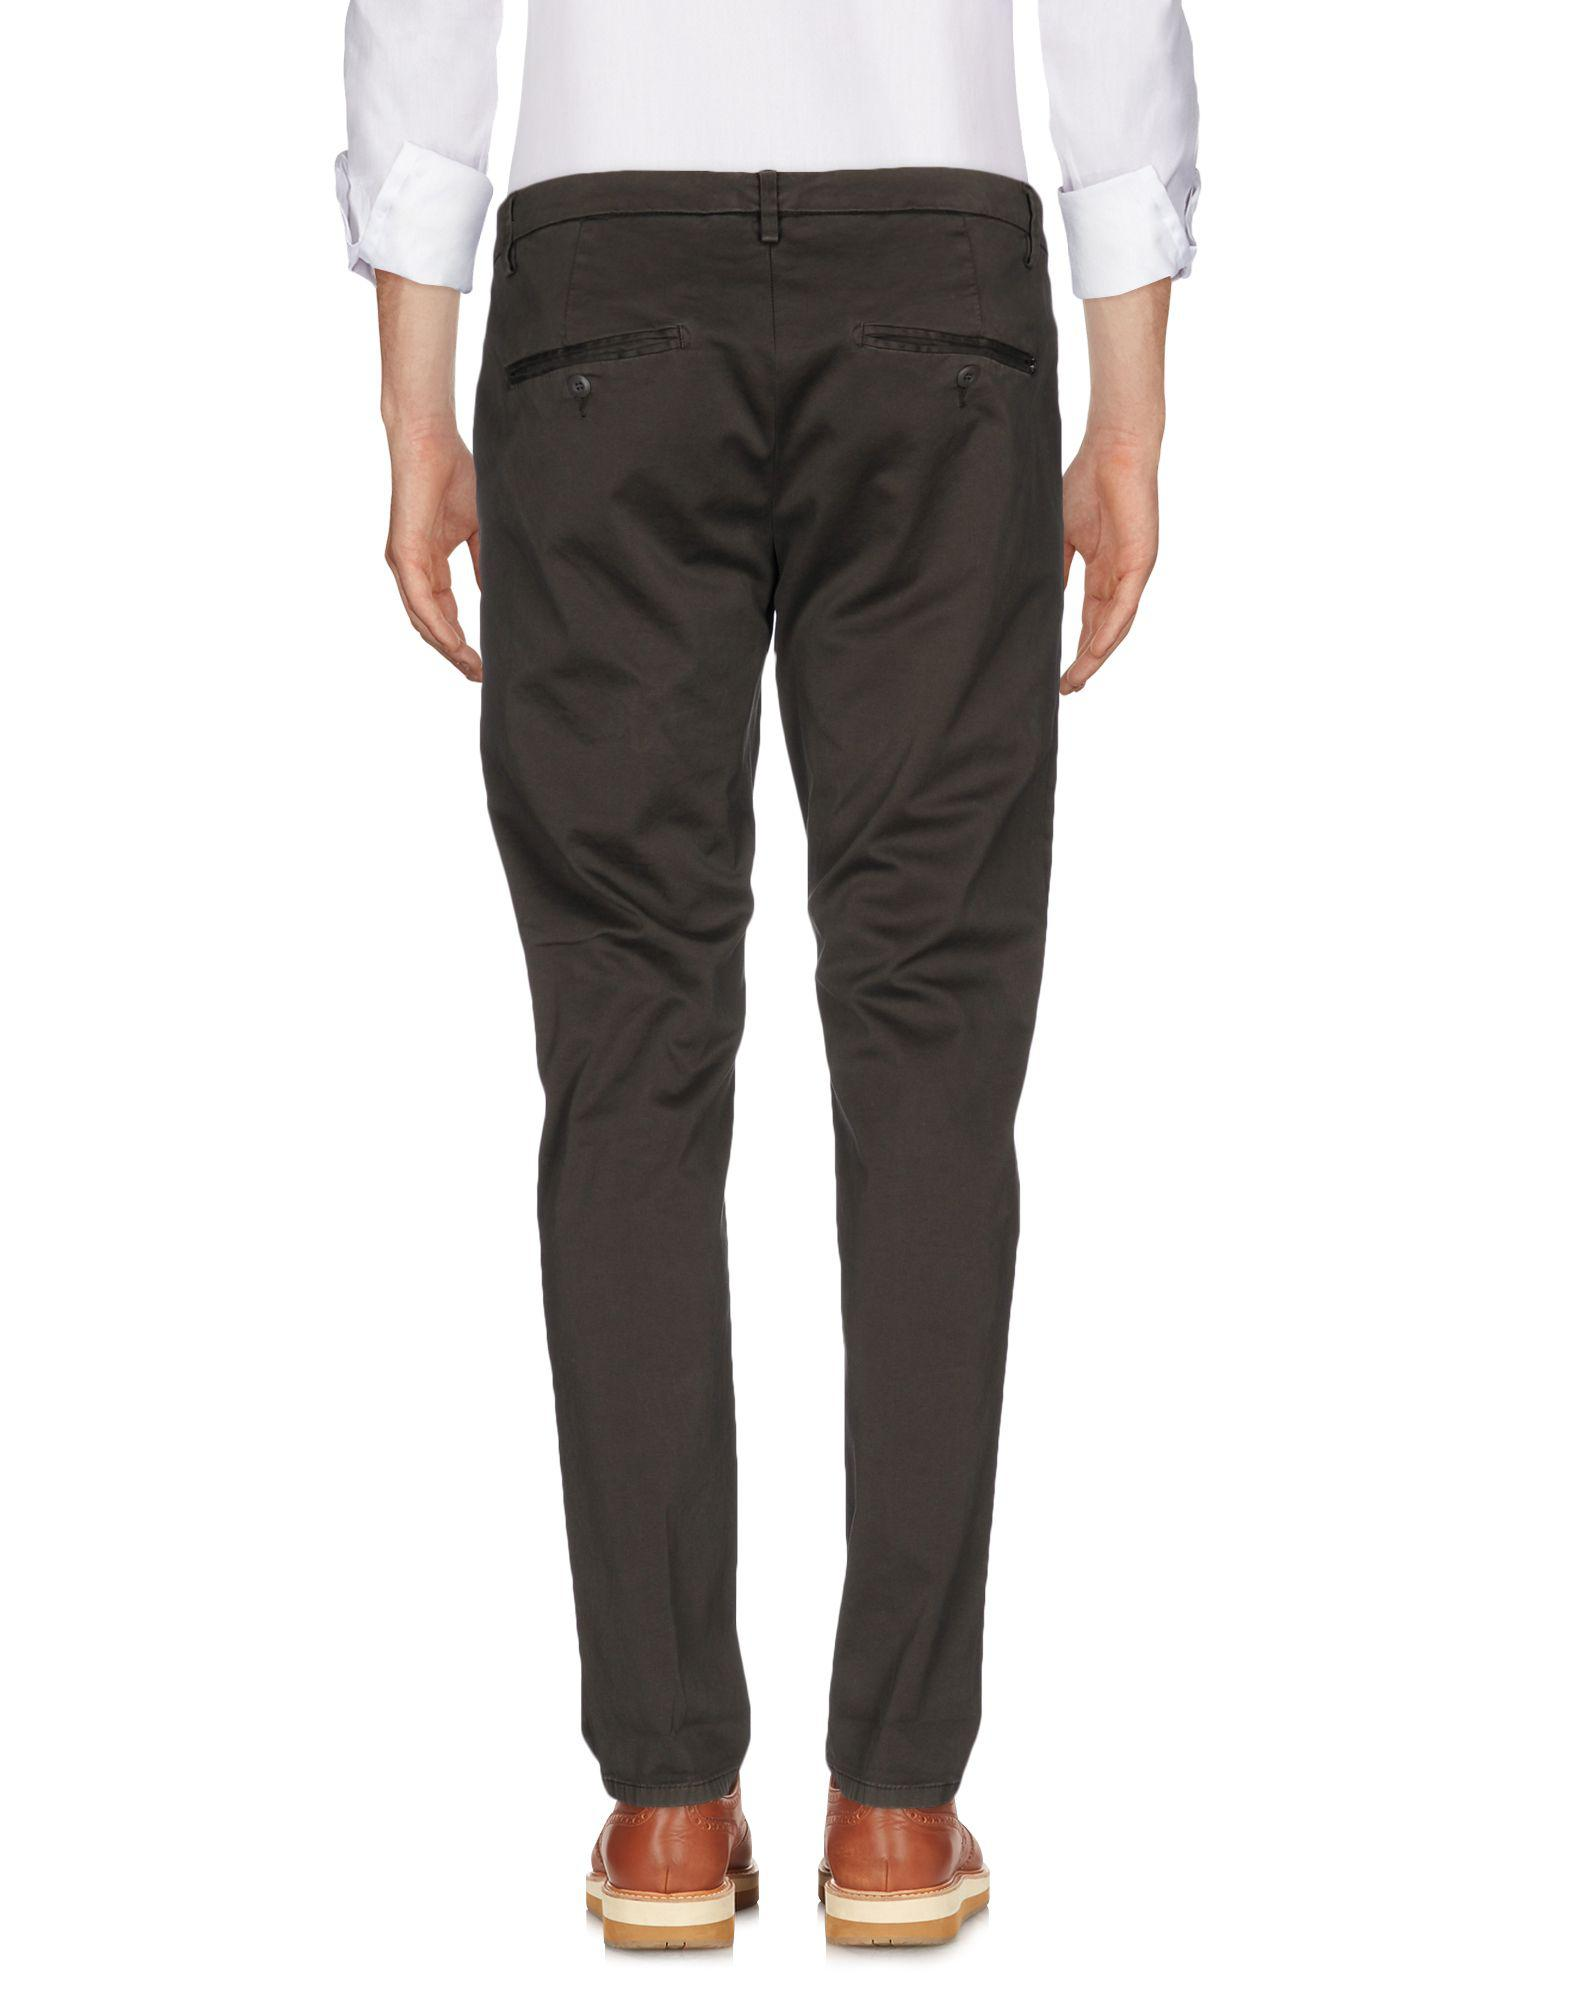 Dondup Cotton Casual Pants in Dark Brown (Brown) for Men